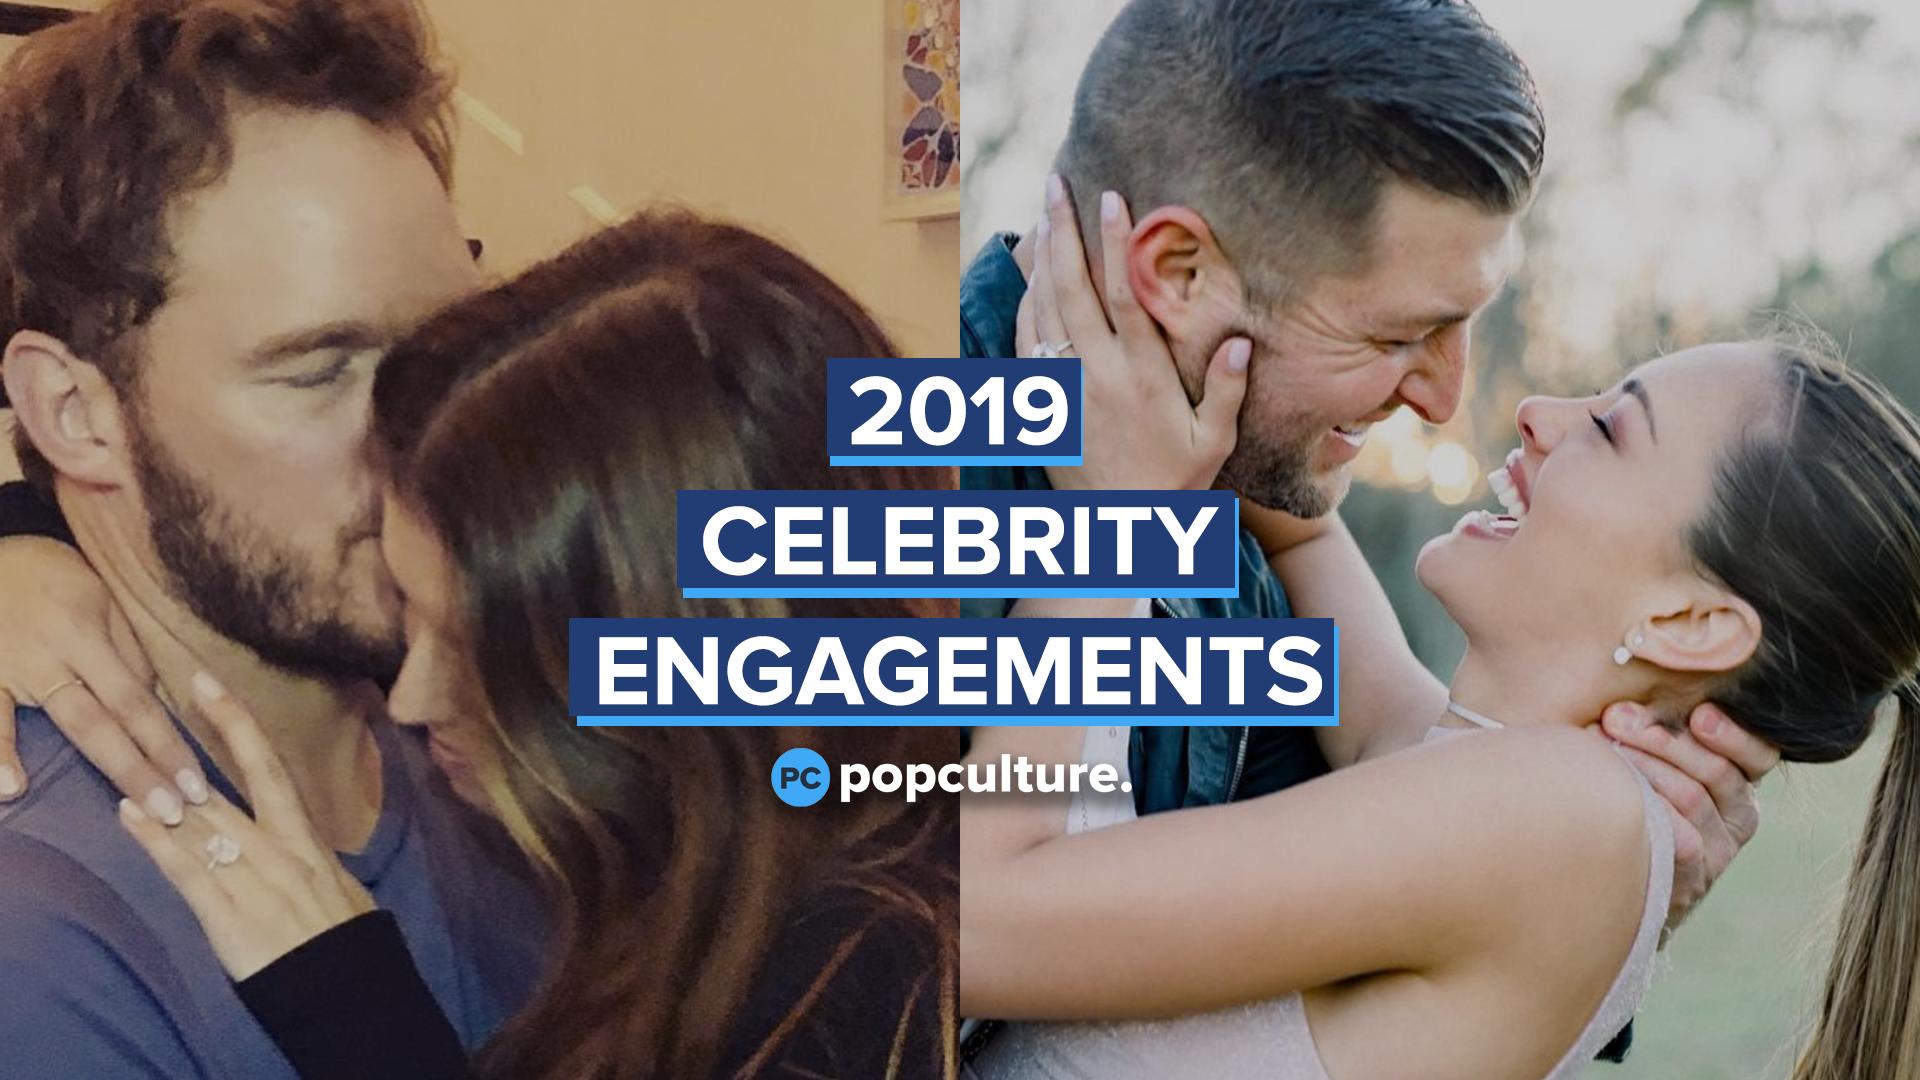 2019 Celebrity Engagements screen capture